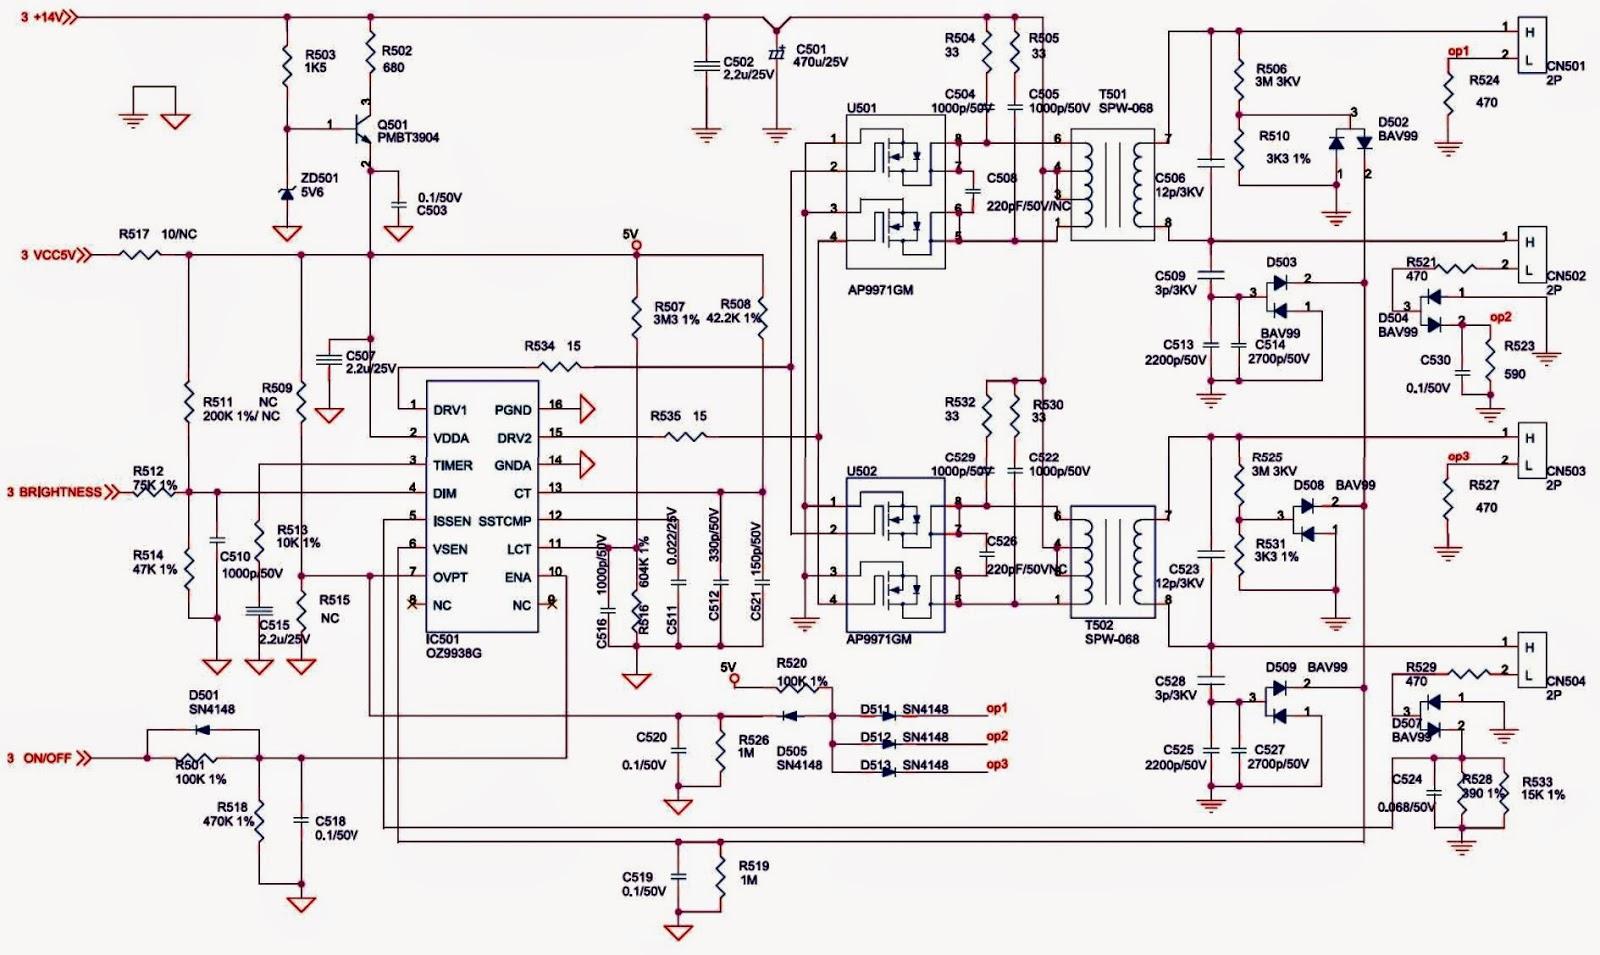 Jbl Prv 175 Wiring Diagram - wiring diagrams schematics